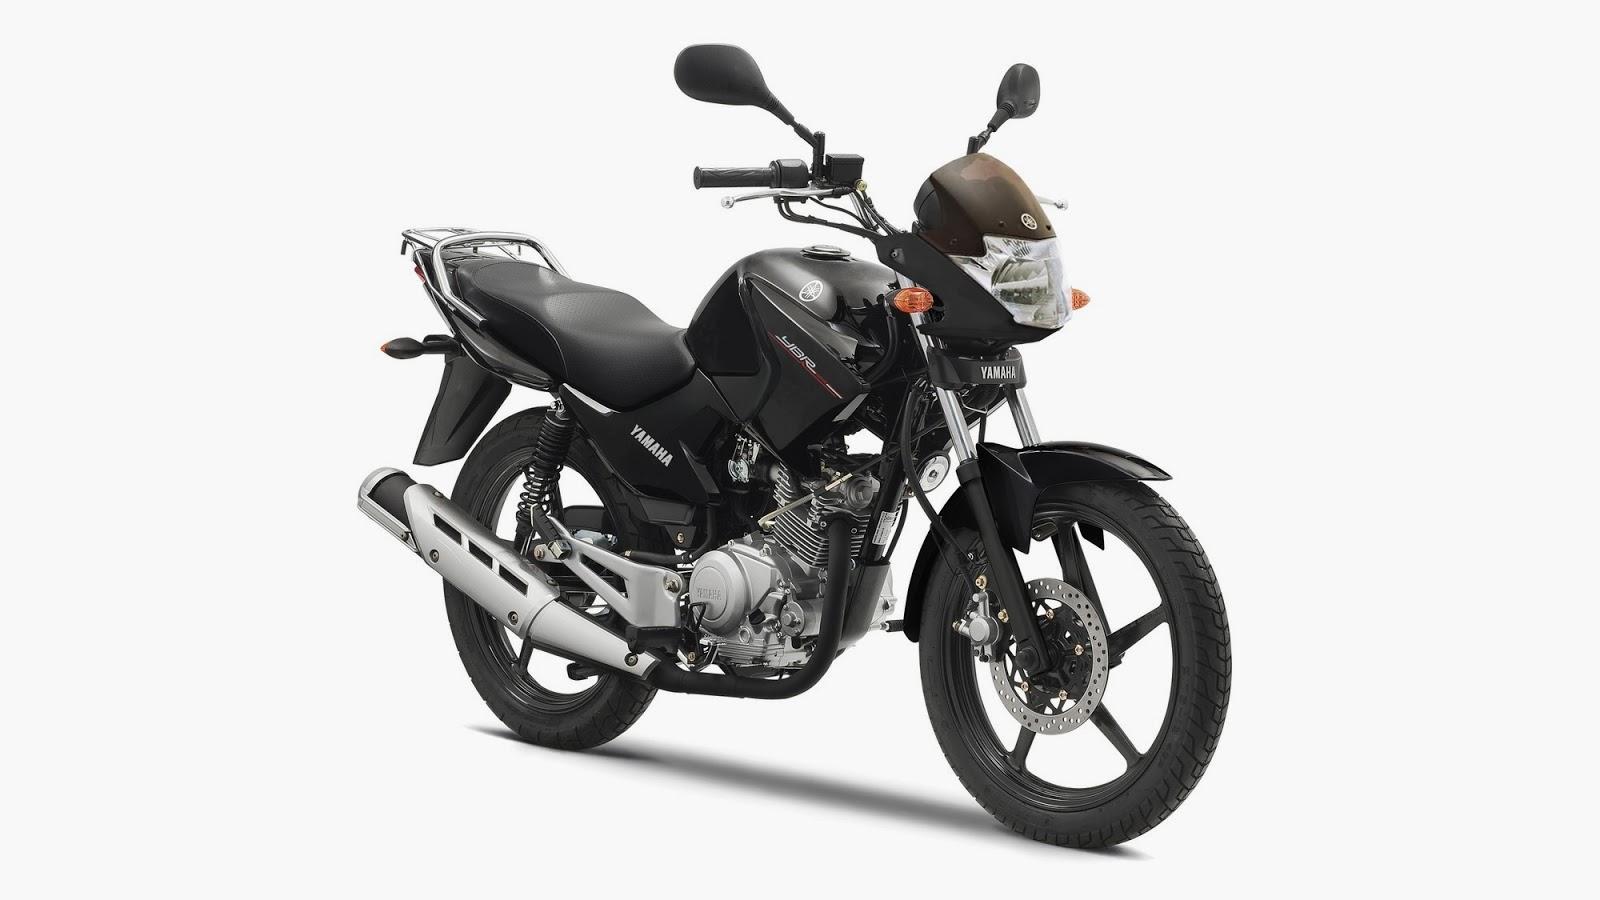 Yamaha Sport Roadster YBR 125 cc Bikes